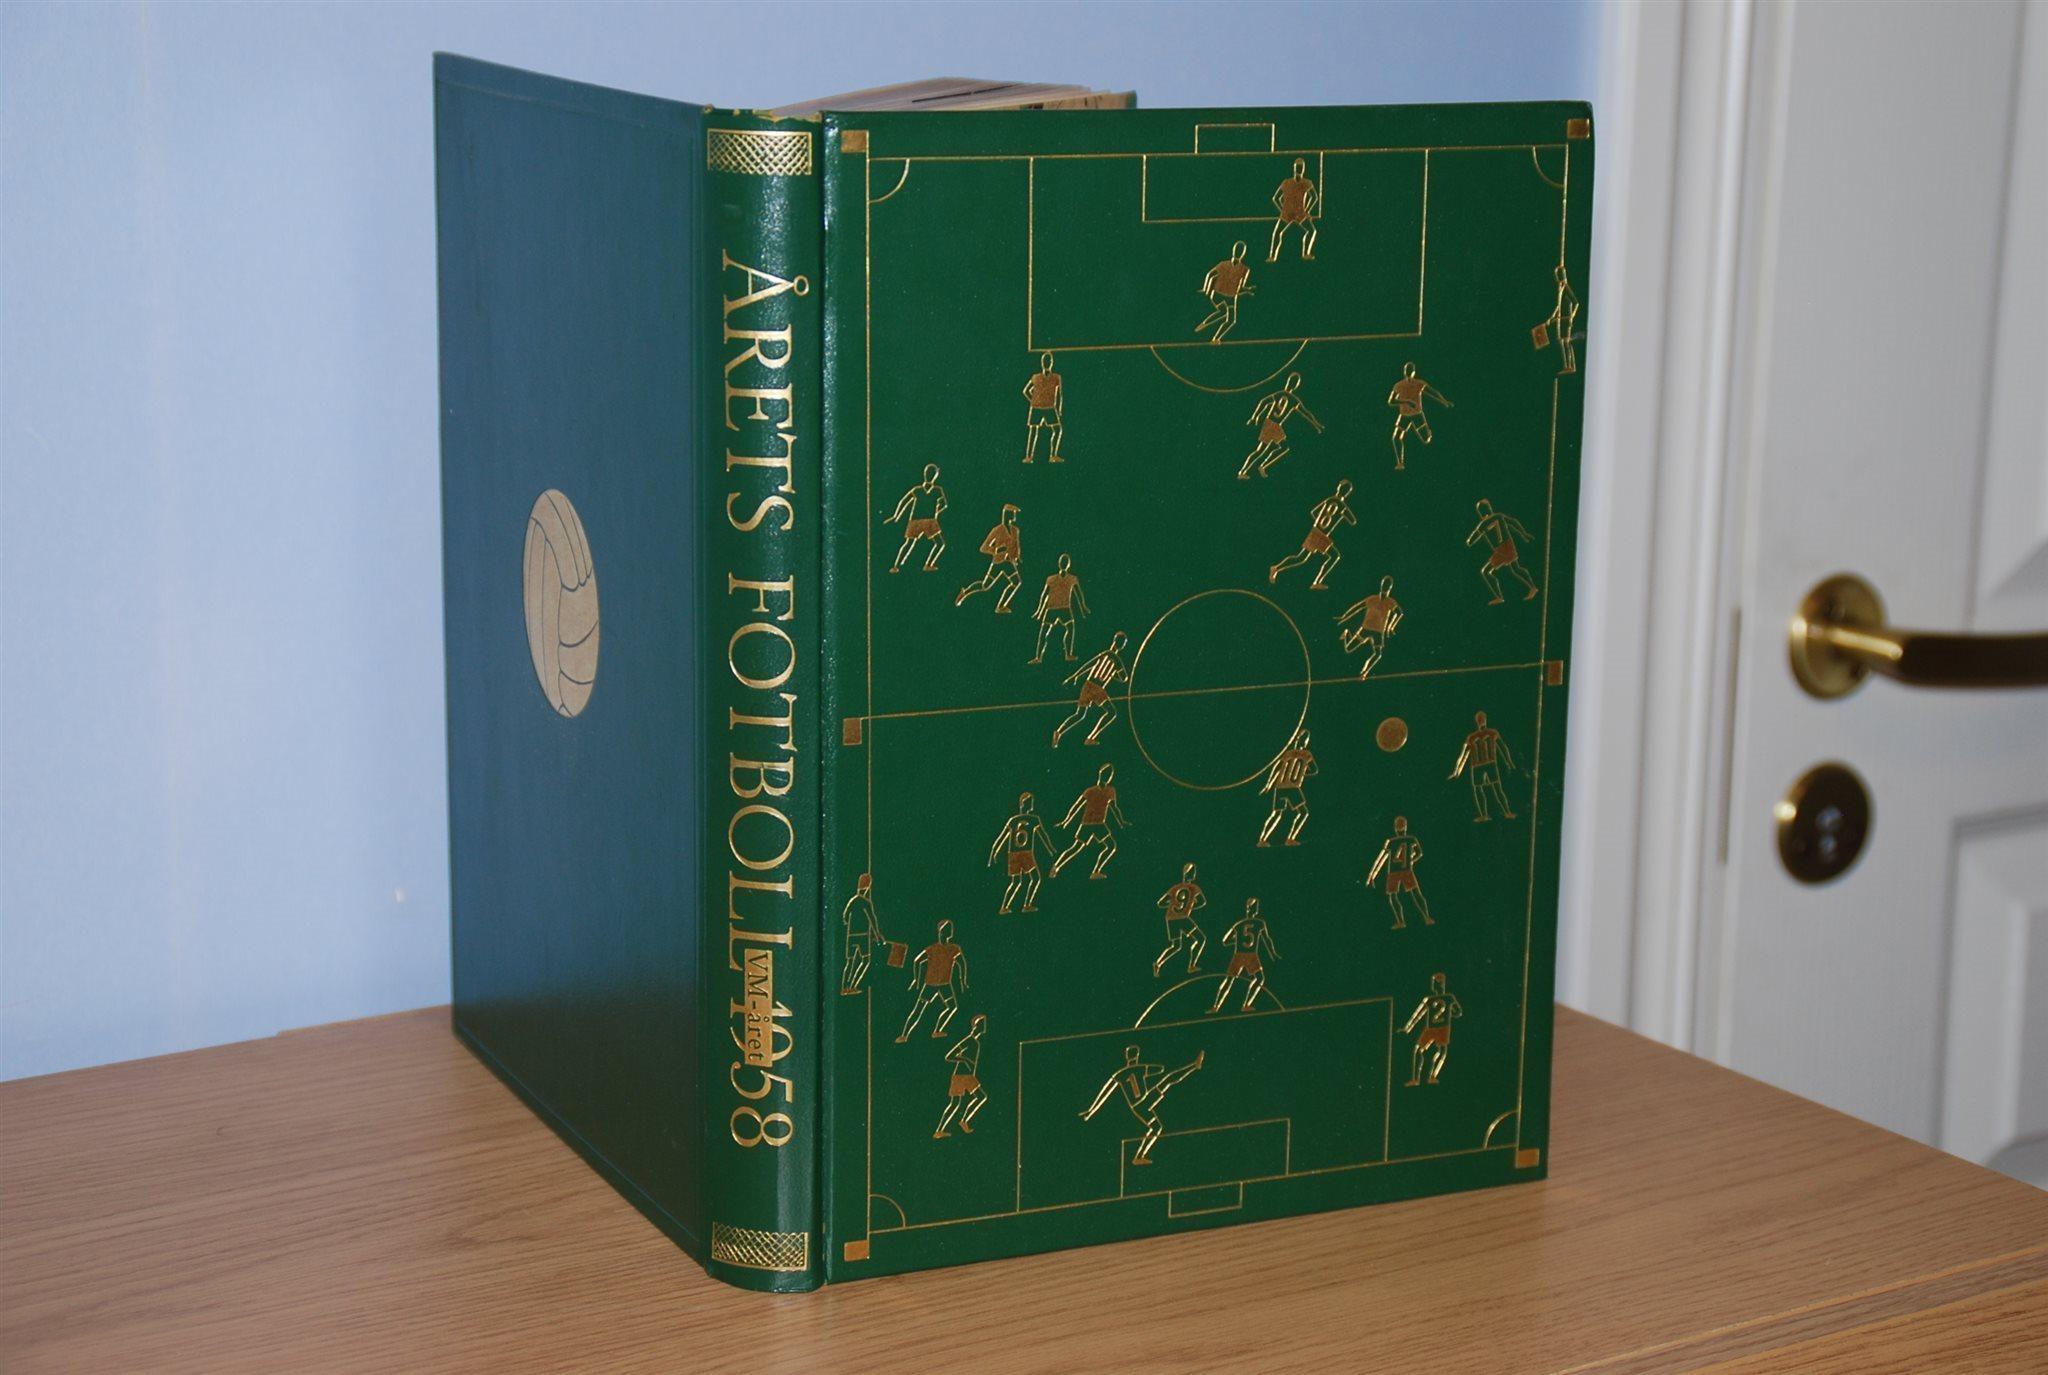 sveriges Fotbollslandslag I Vm 1958 34478556c0fc8